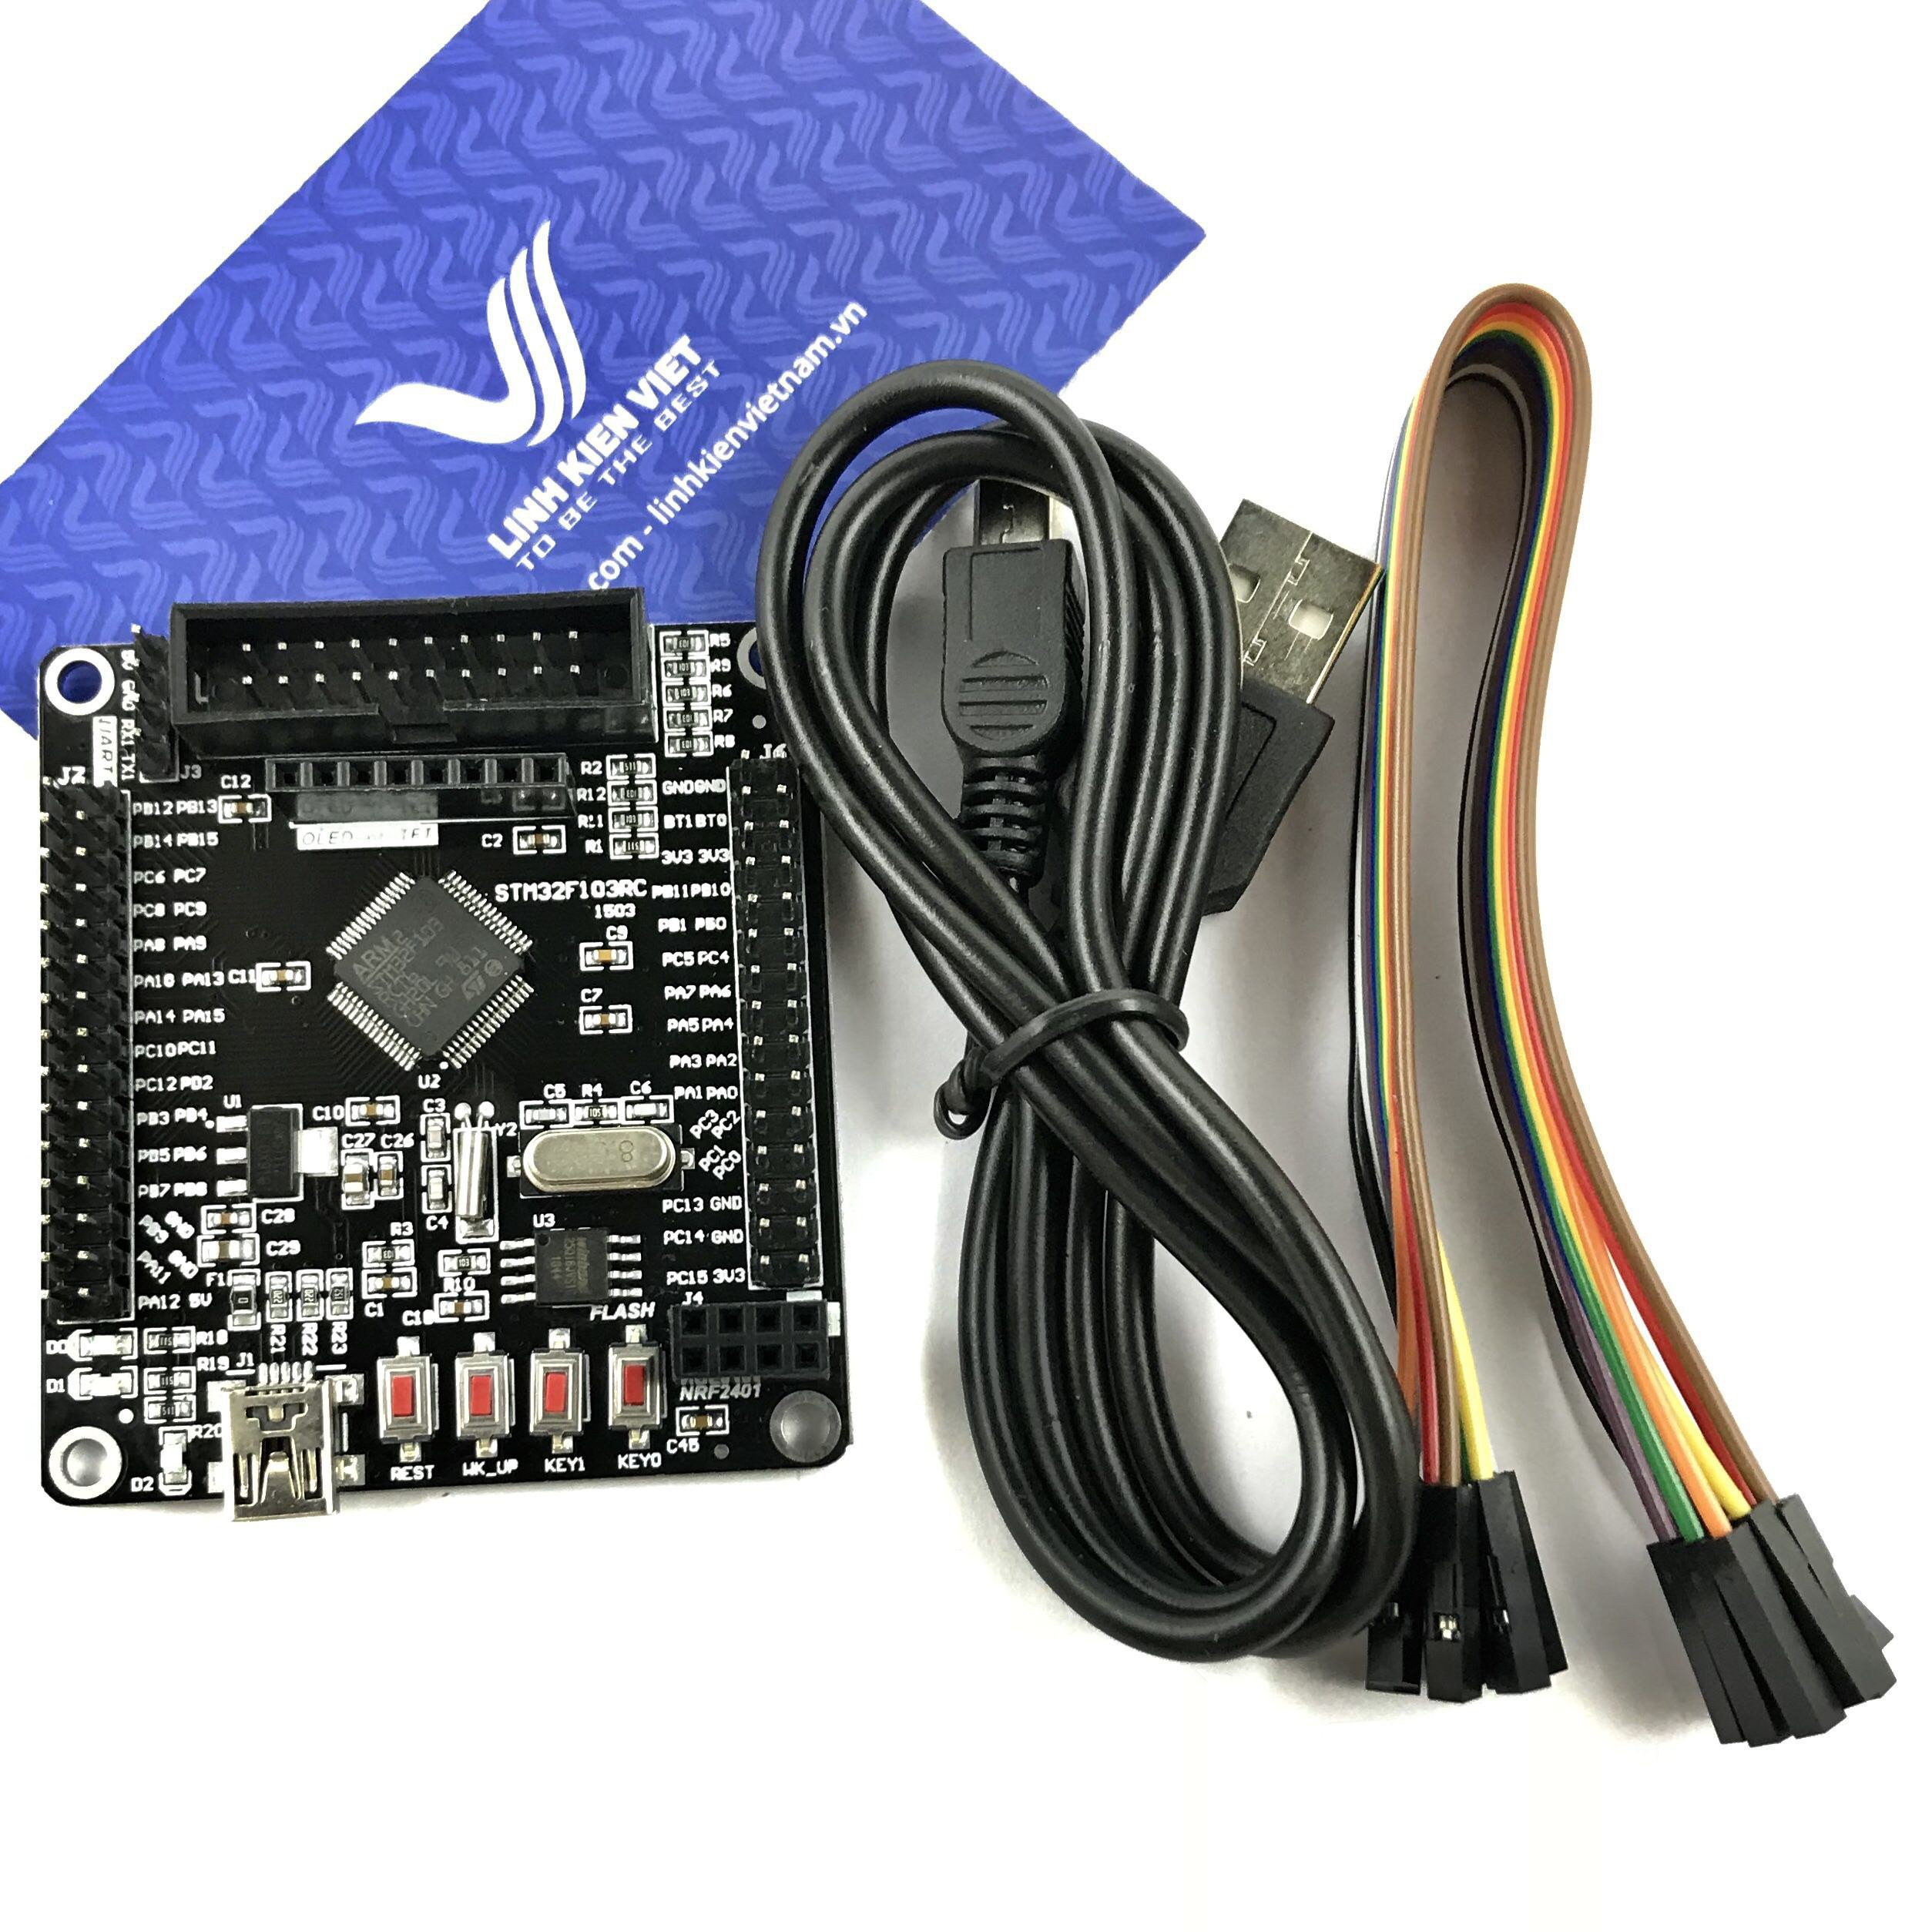 Kit Phát Triển STM32F103RCT6 ARM Cortex-M3 Mini - I2H10